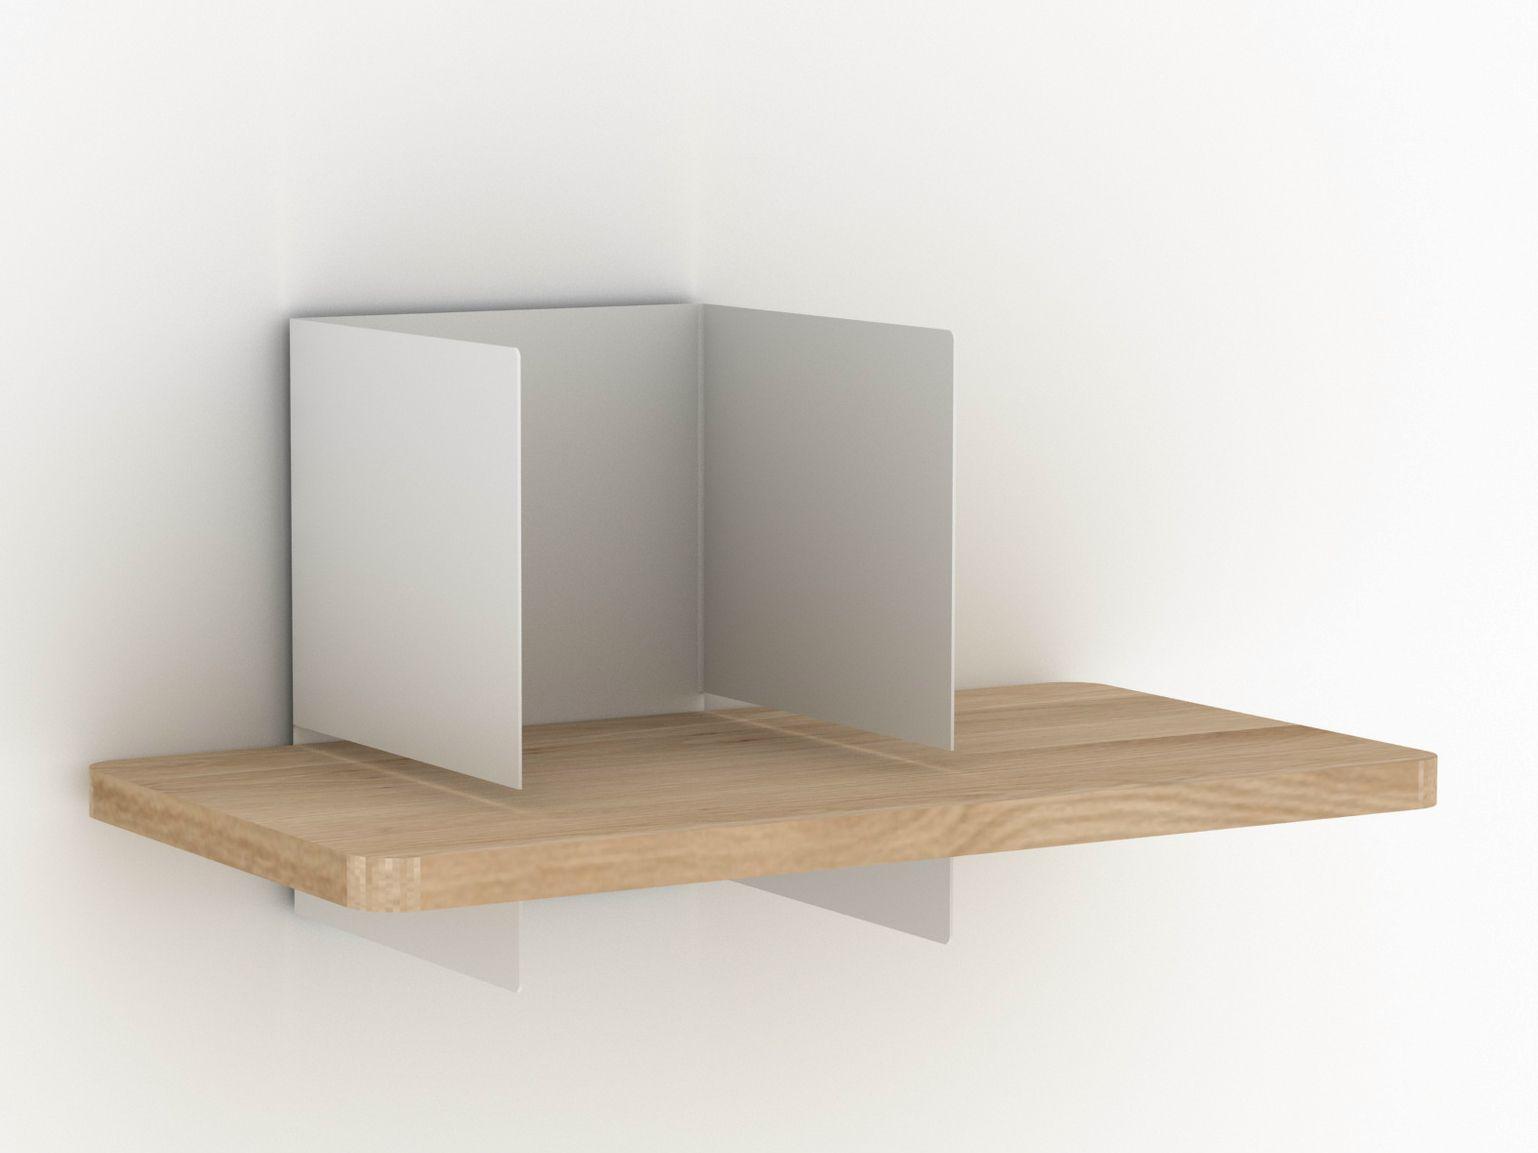 Oak and metal wall shelf clip wall shelf small by universo positivo - Wall metal shelf ...